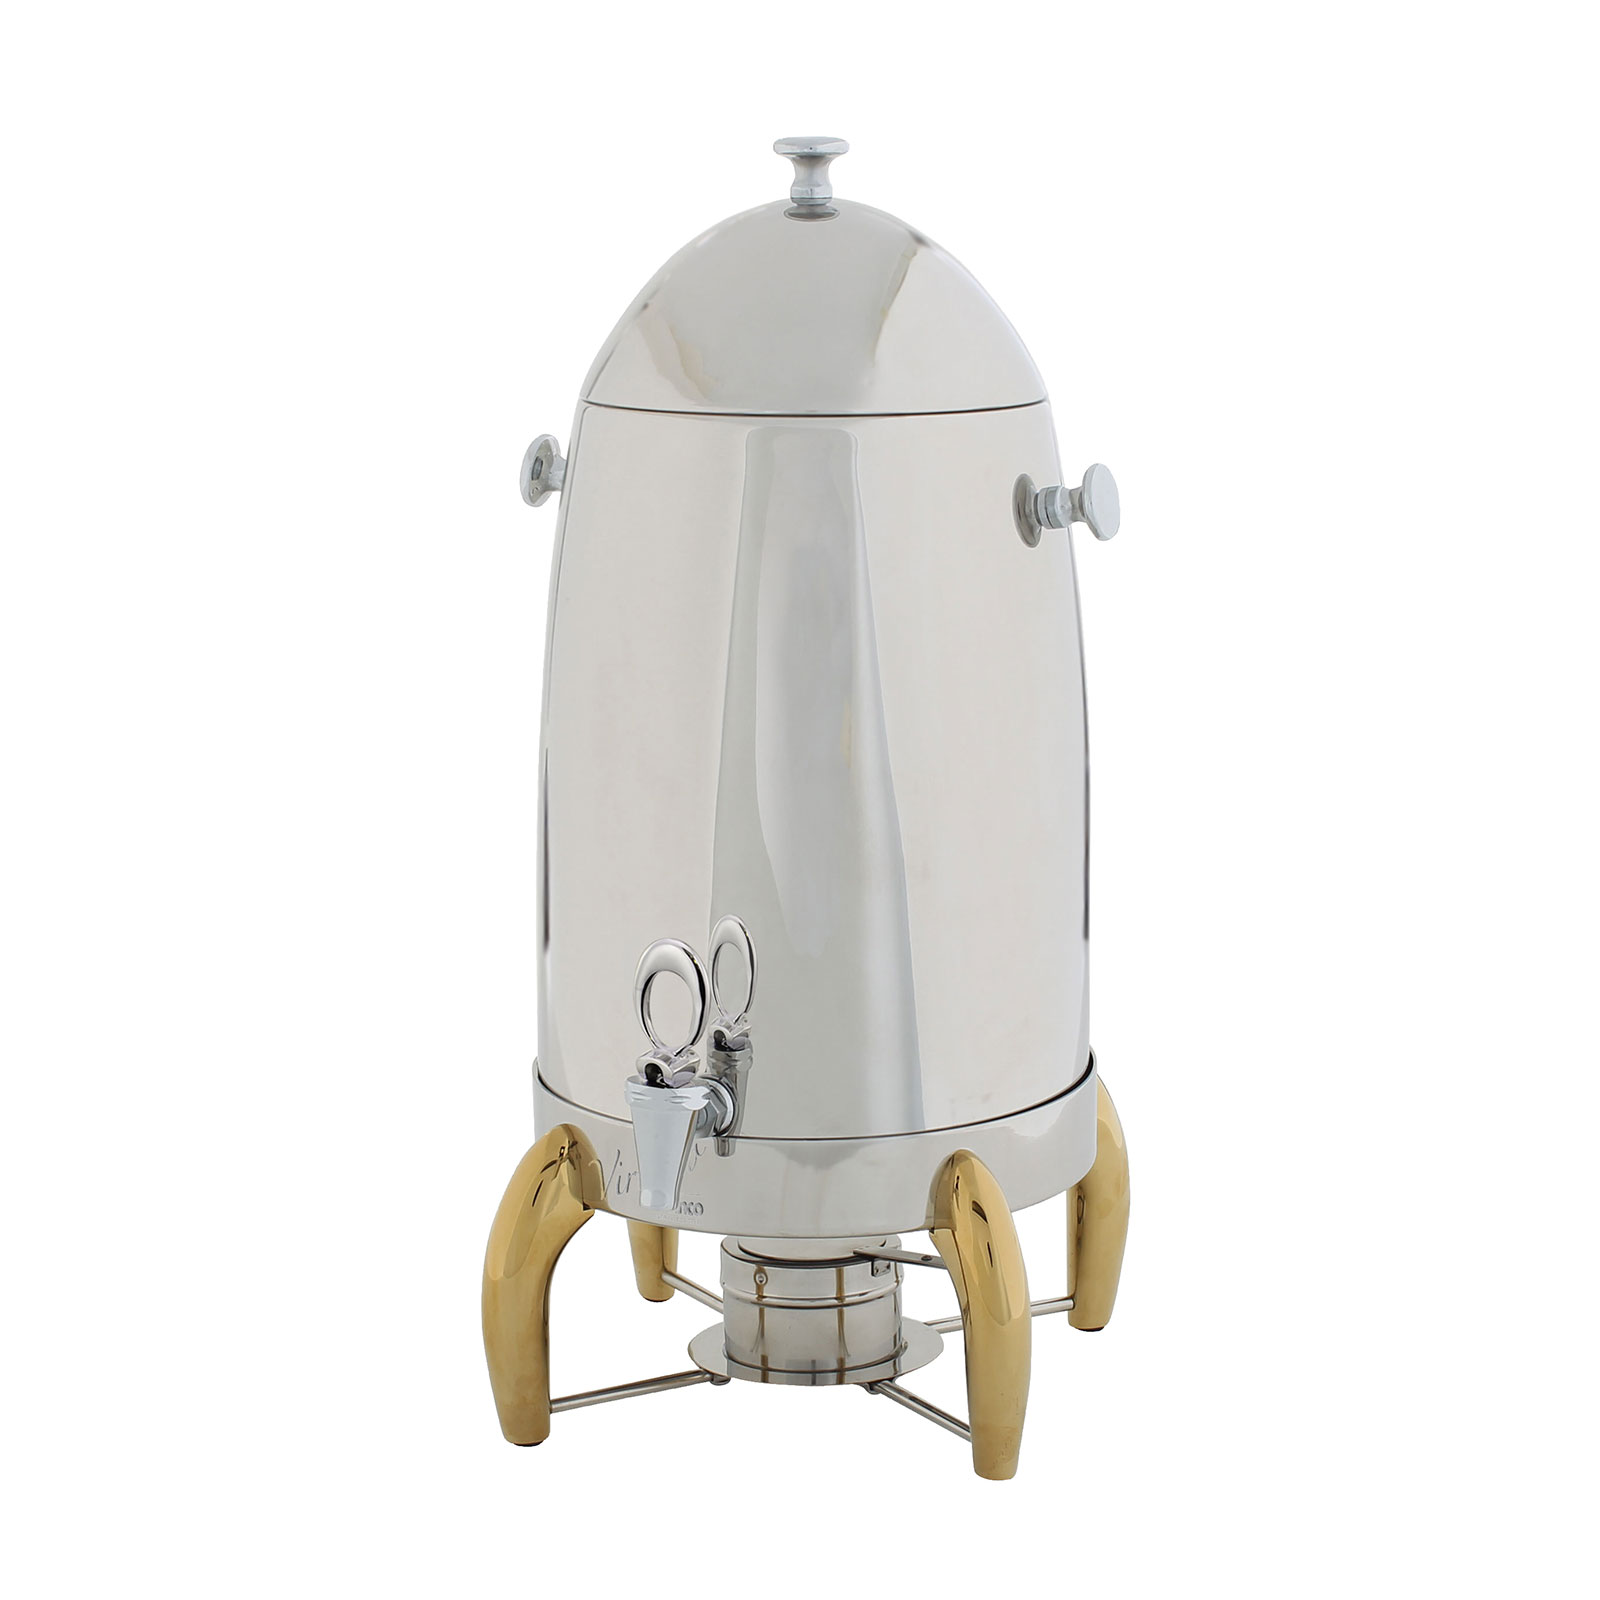 Winco 905A coffee chafer urn